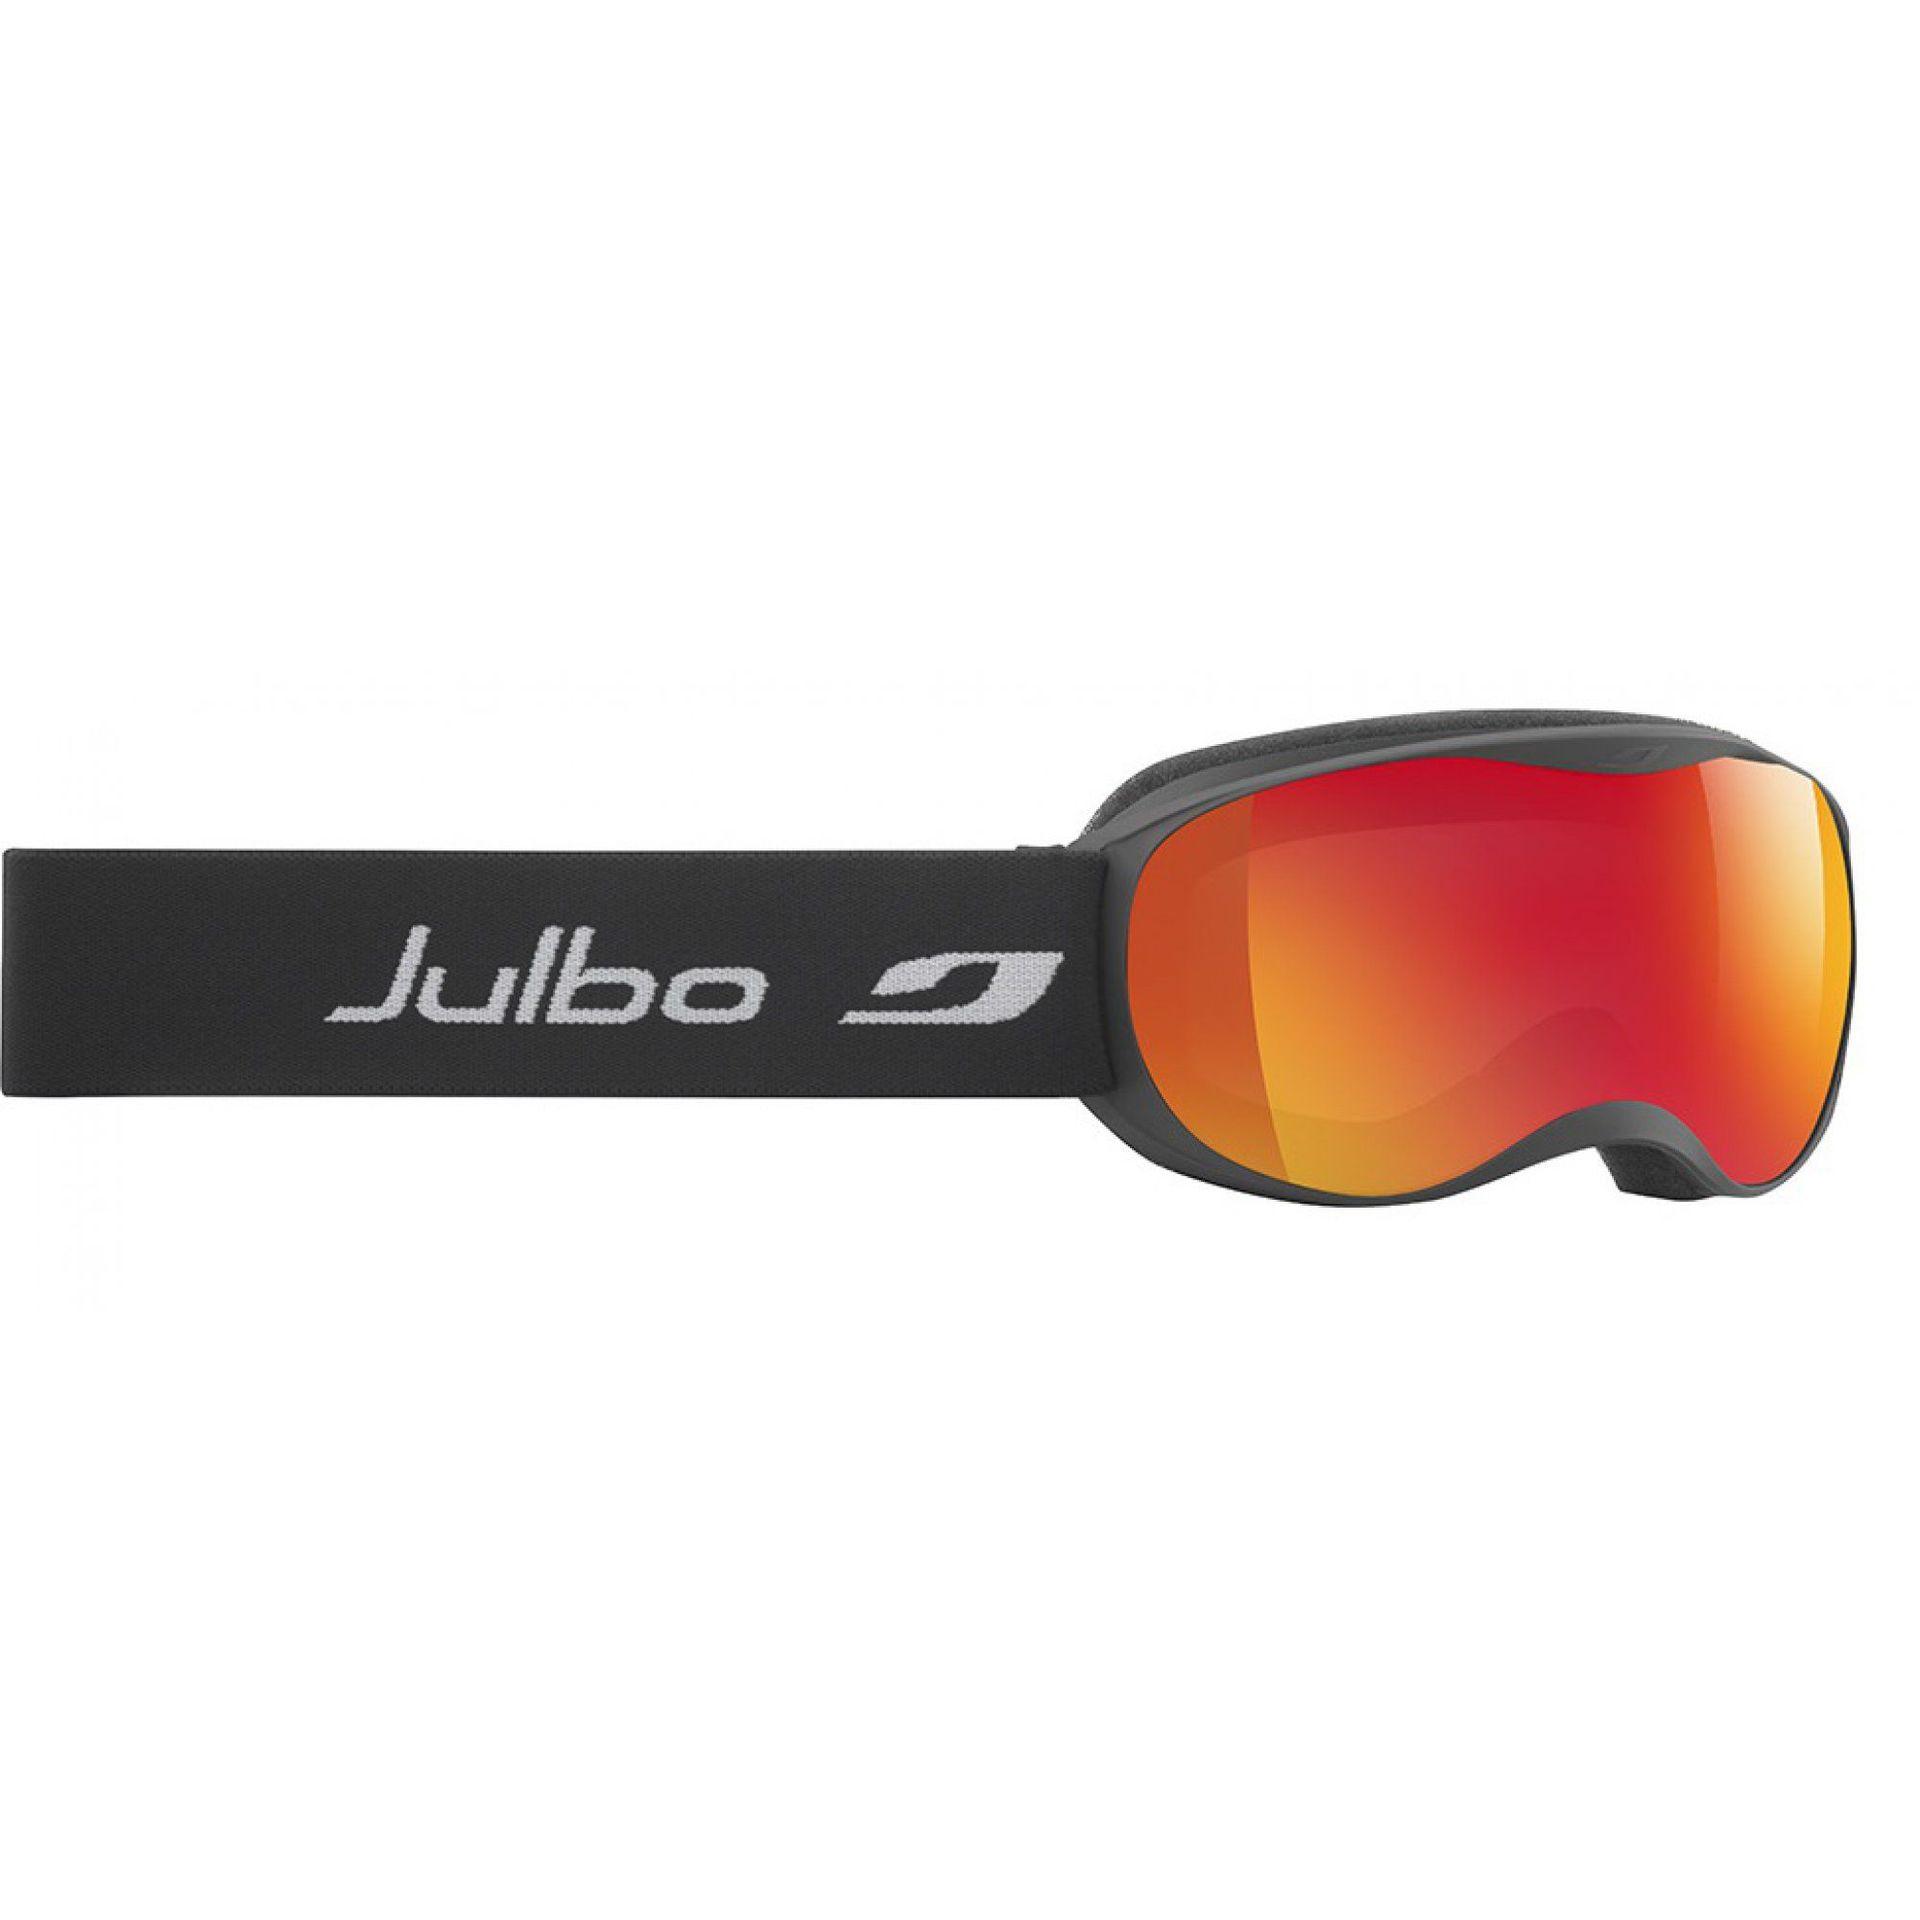 GOGLE JULBO ATMO BLACK|ORANGE SCREEN|MULTILAYER FIRE SPECTRON